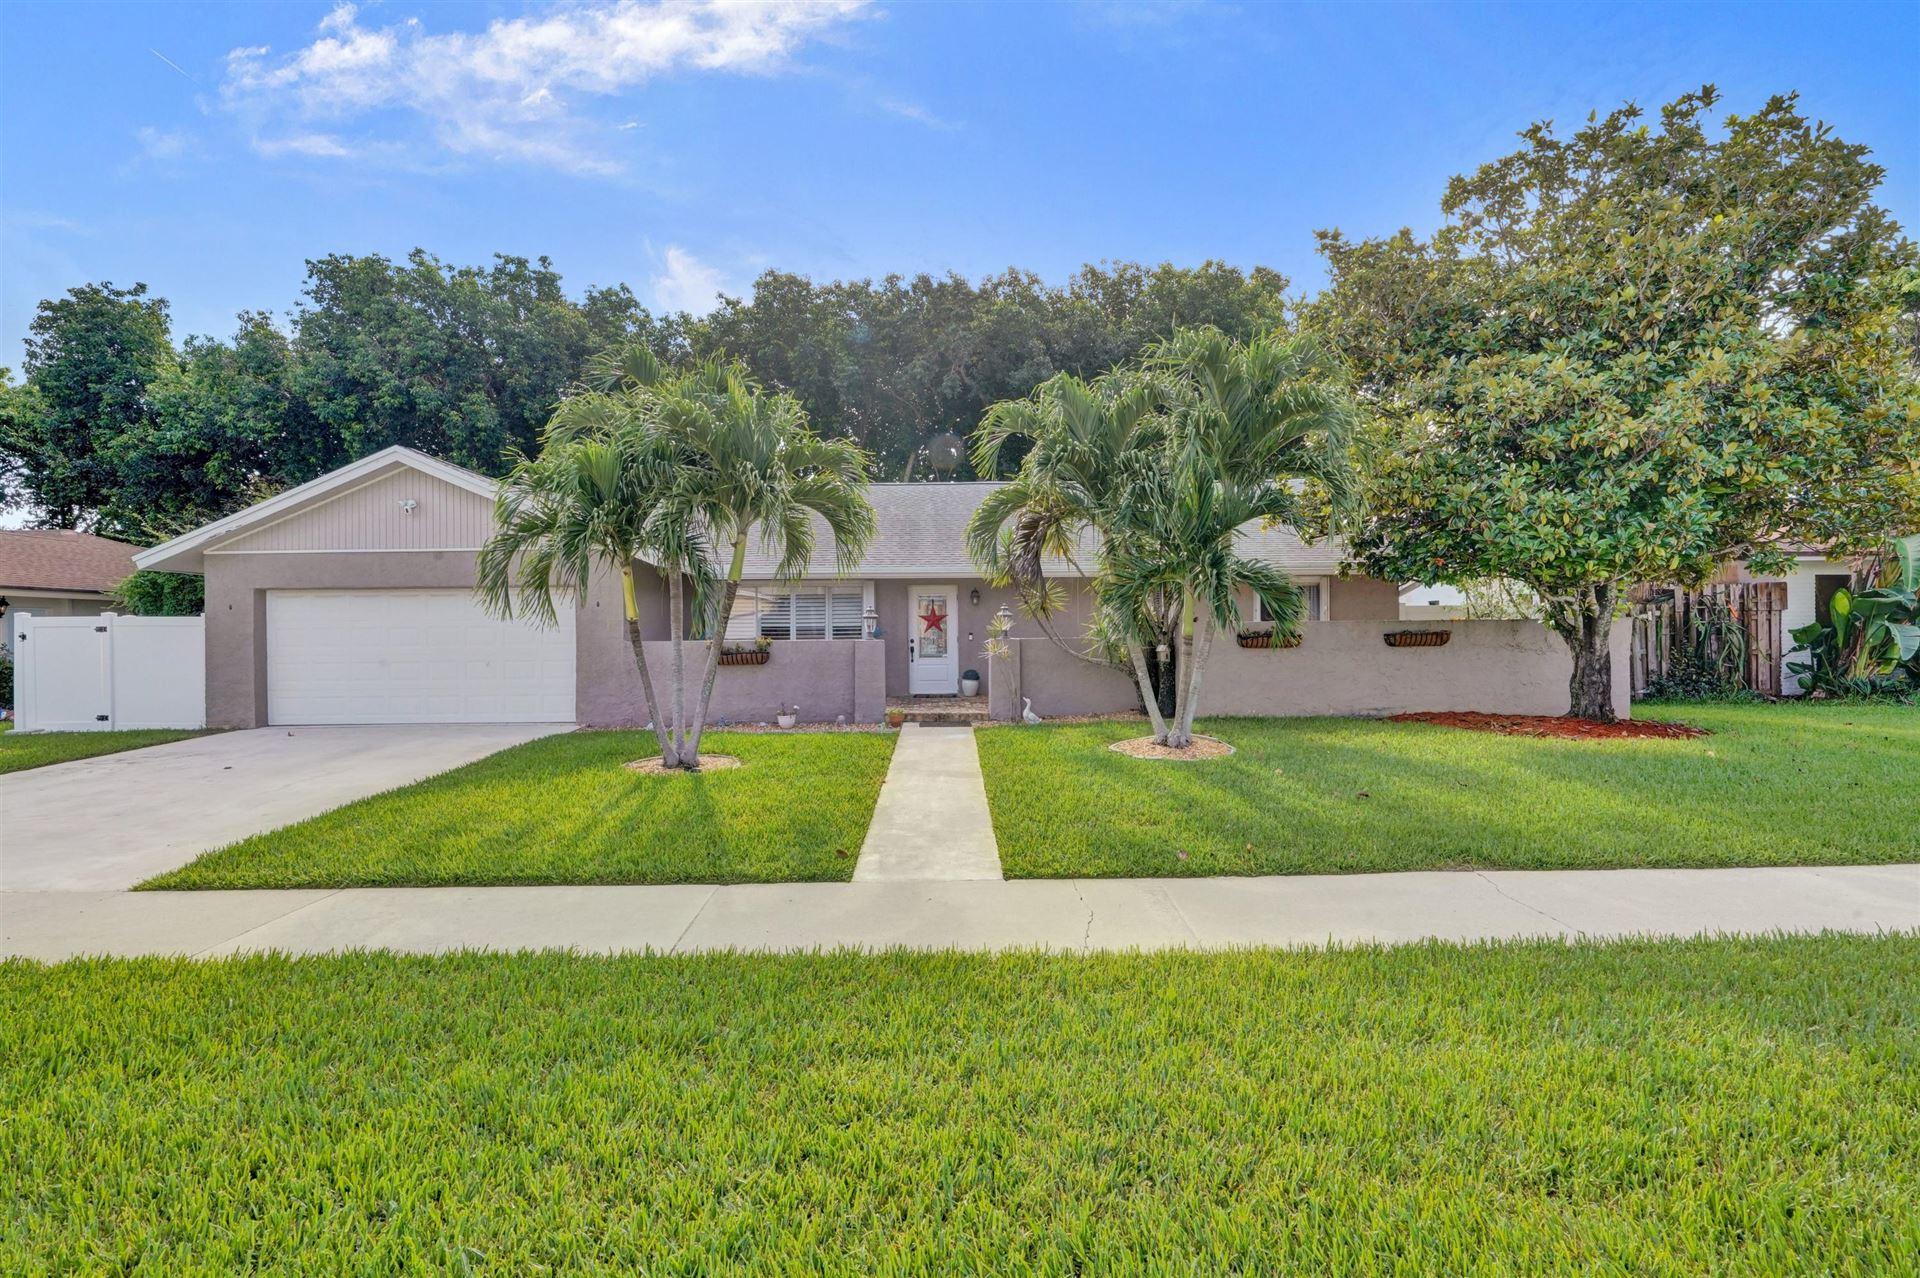 4035 Birchwood Drive, Boca Raton, FL 33487 - #: RX-10632319